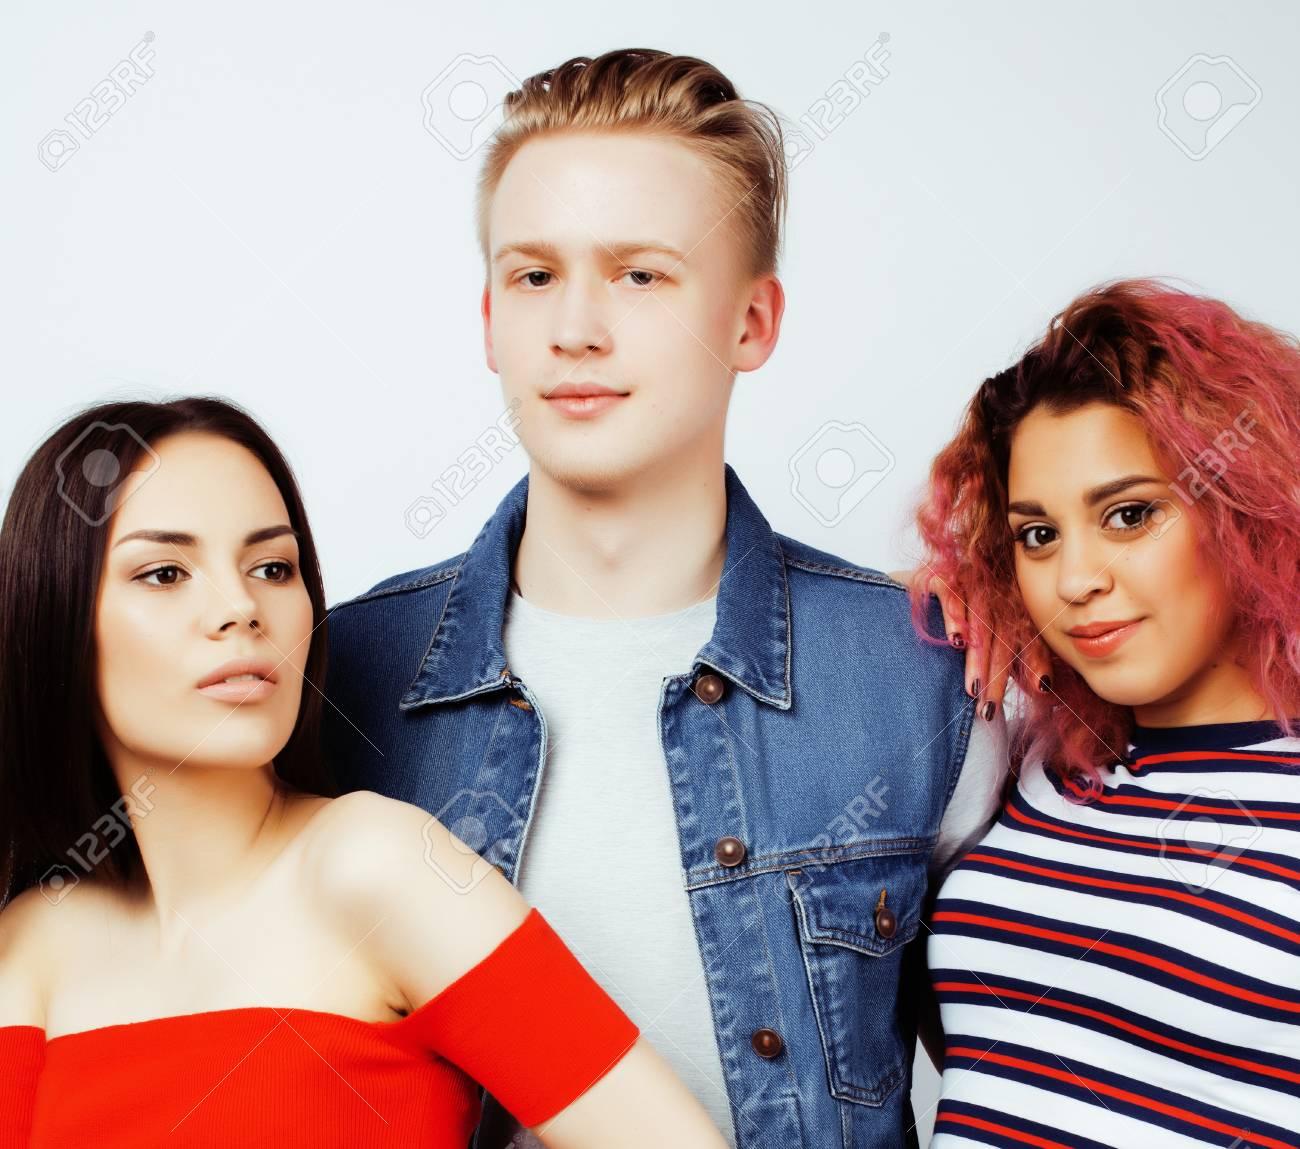 Blonde Jungs Coole Frisuren Blonde Jungs 2019 09 19